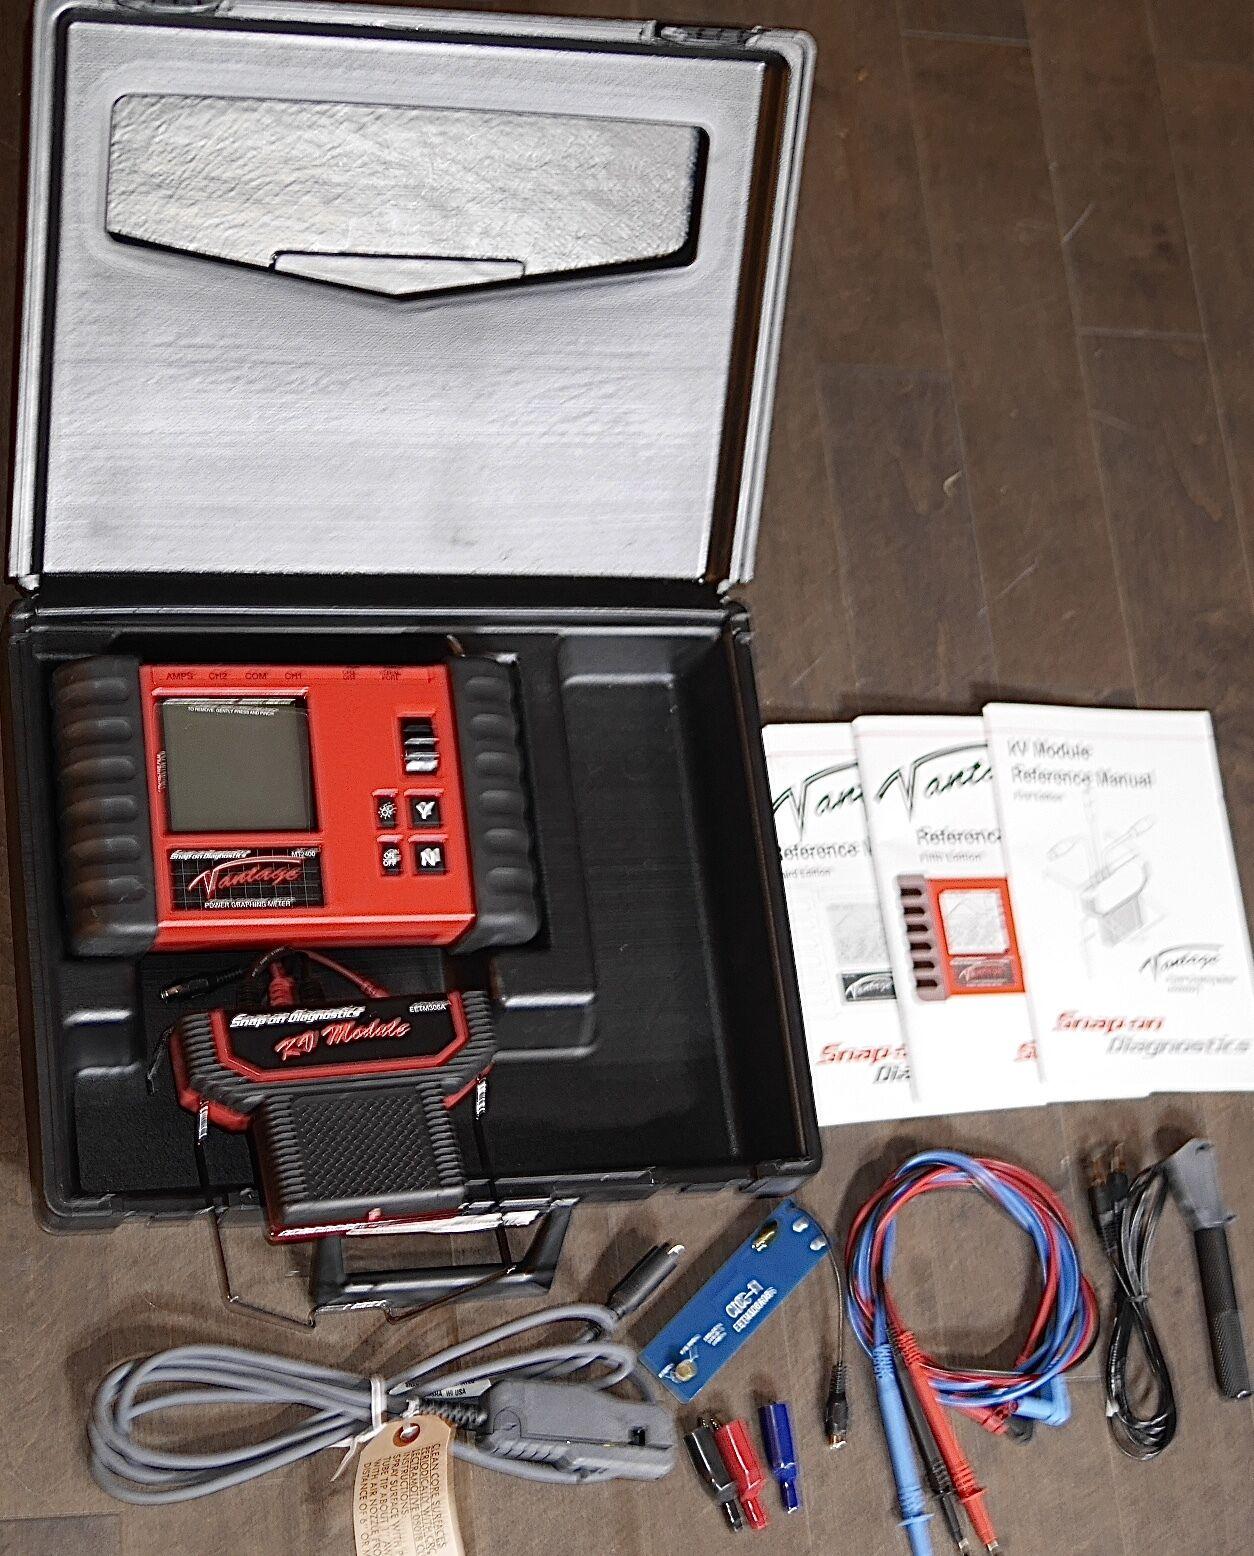 Snap On Mt2400 Vantage Diagnostic Power Graphing Meter/kv